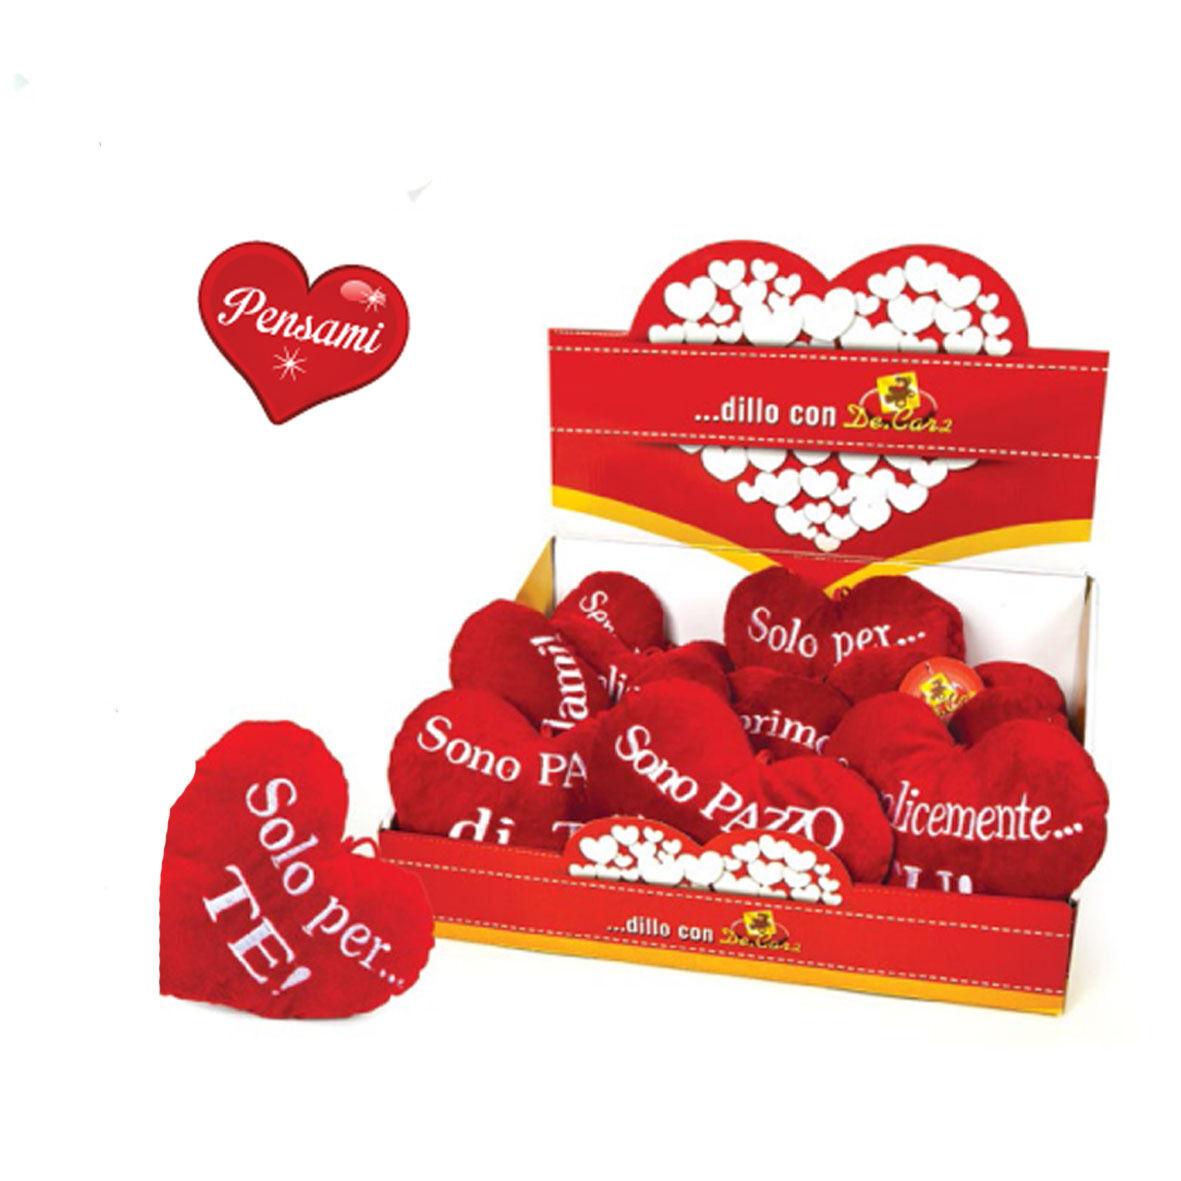 AMORE cuscino cuore rosso varie scritte ricamate idea regalo romantica 16,5 cm